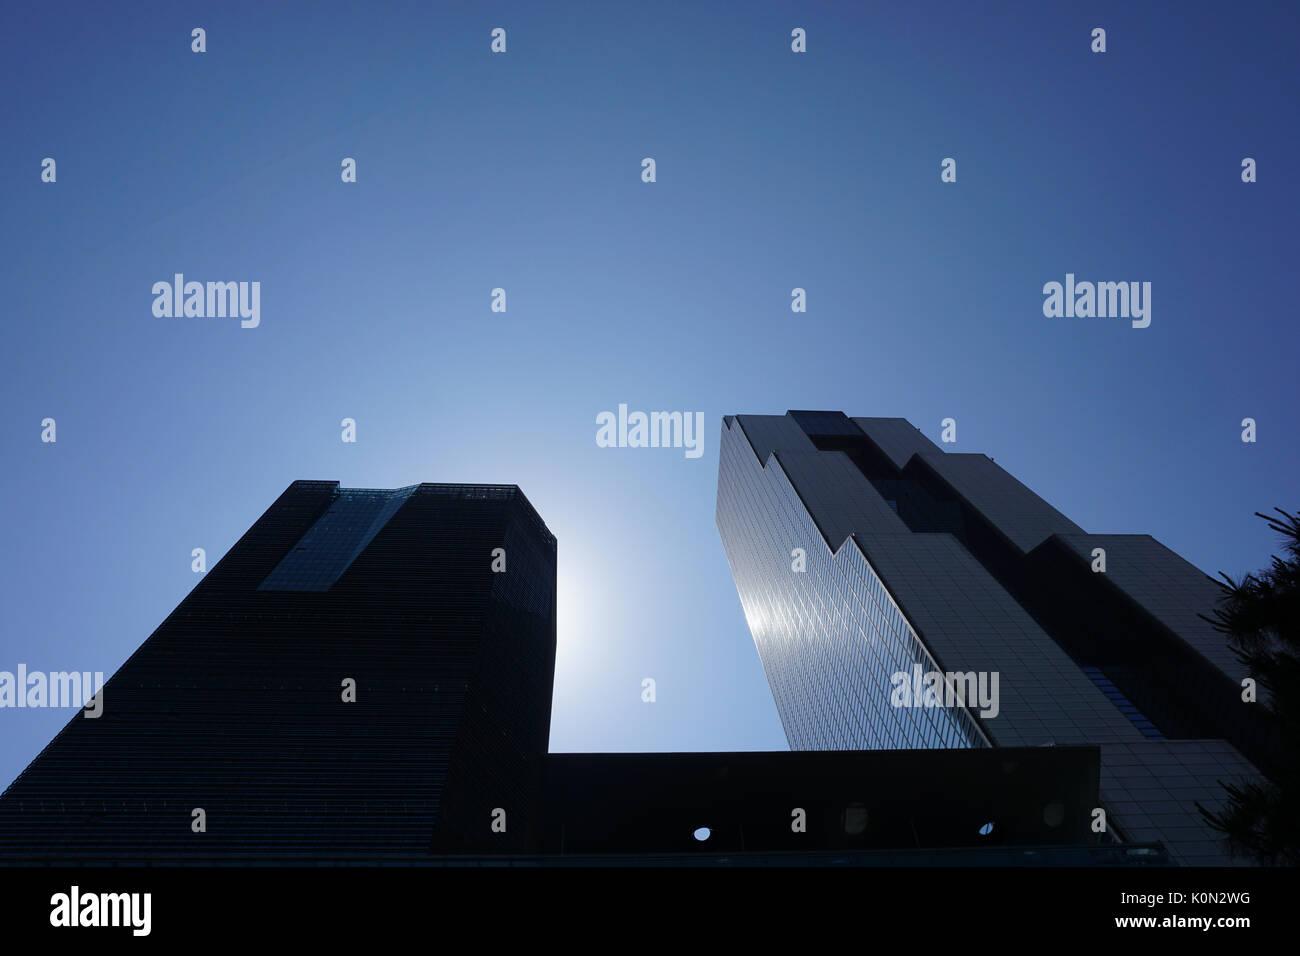 Modern buildings in Korea against blue sky - Stock Image